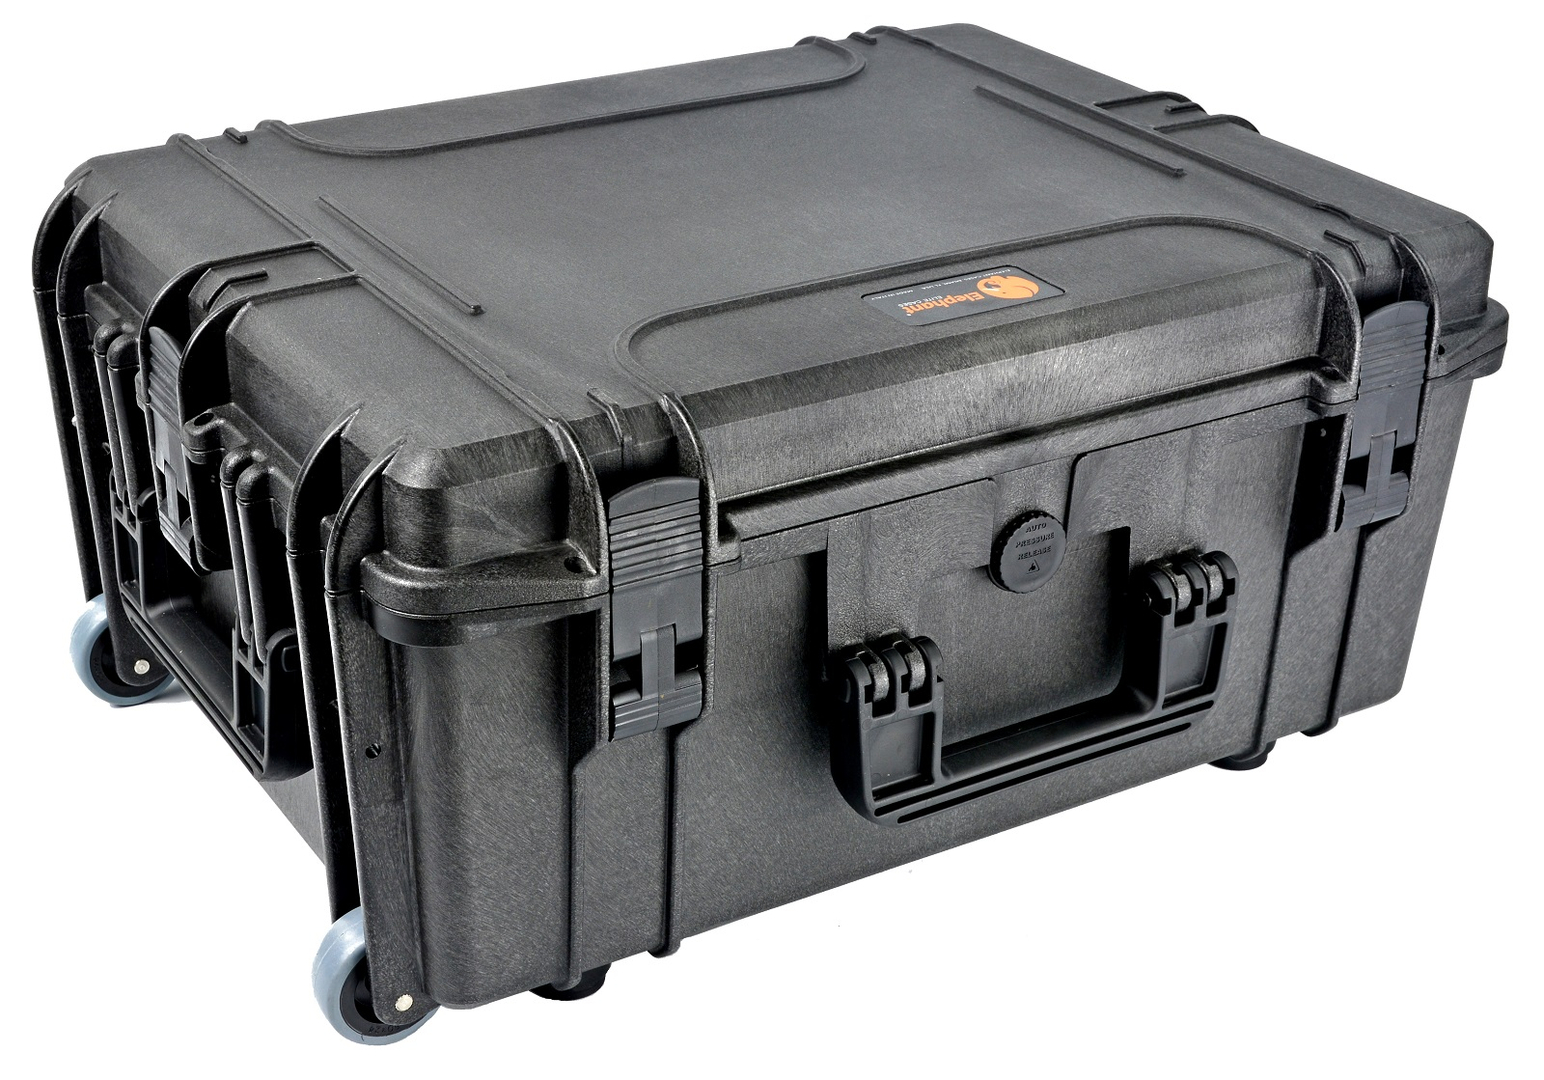 Elephant Cases Waterproof Plastic Cases Camera Cases Gun cases